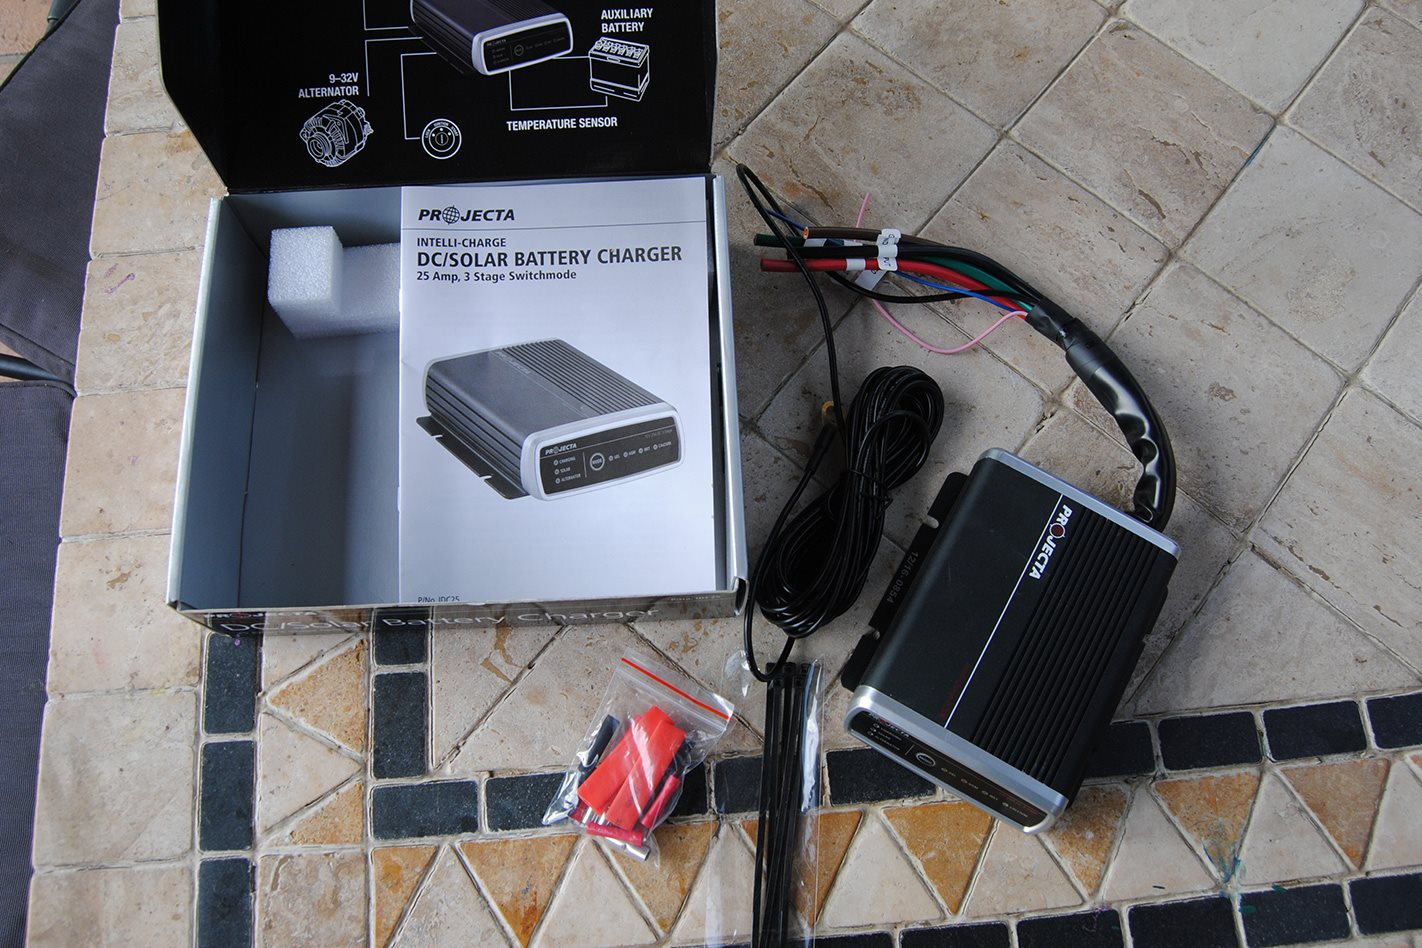 Projecta Intelli-Charge DC kit